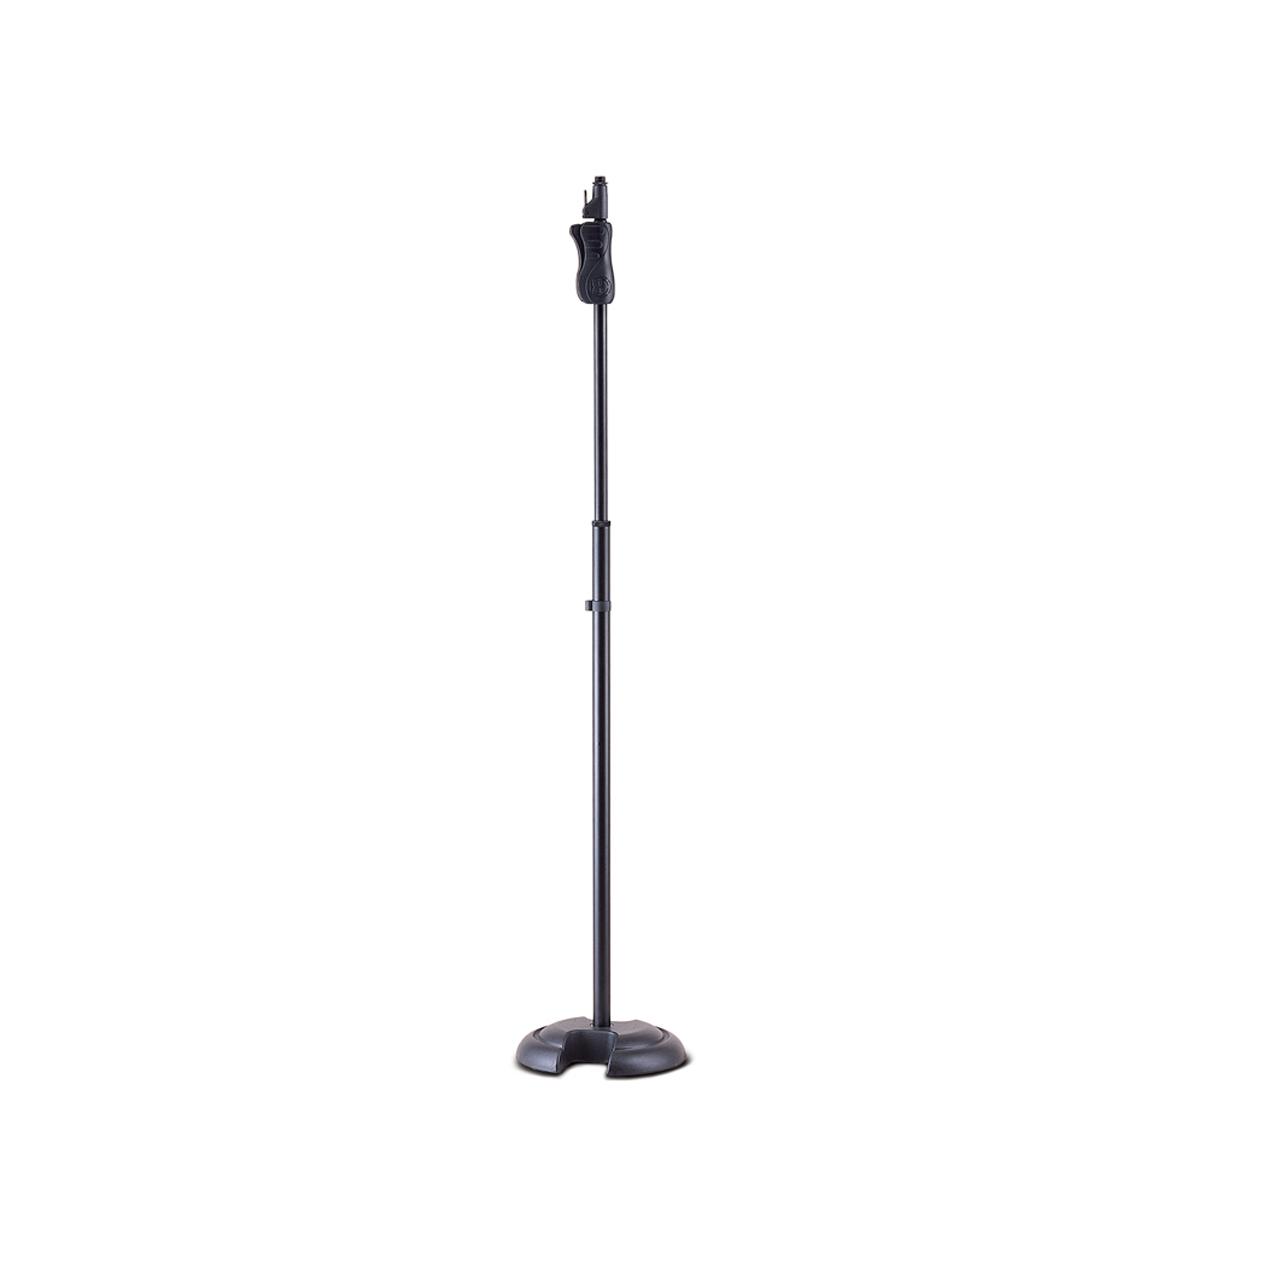 Suporte Pedestal C/base Redonda P/ Microfone Ms201b Hercules  - Audio Video & cia